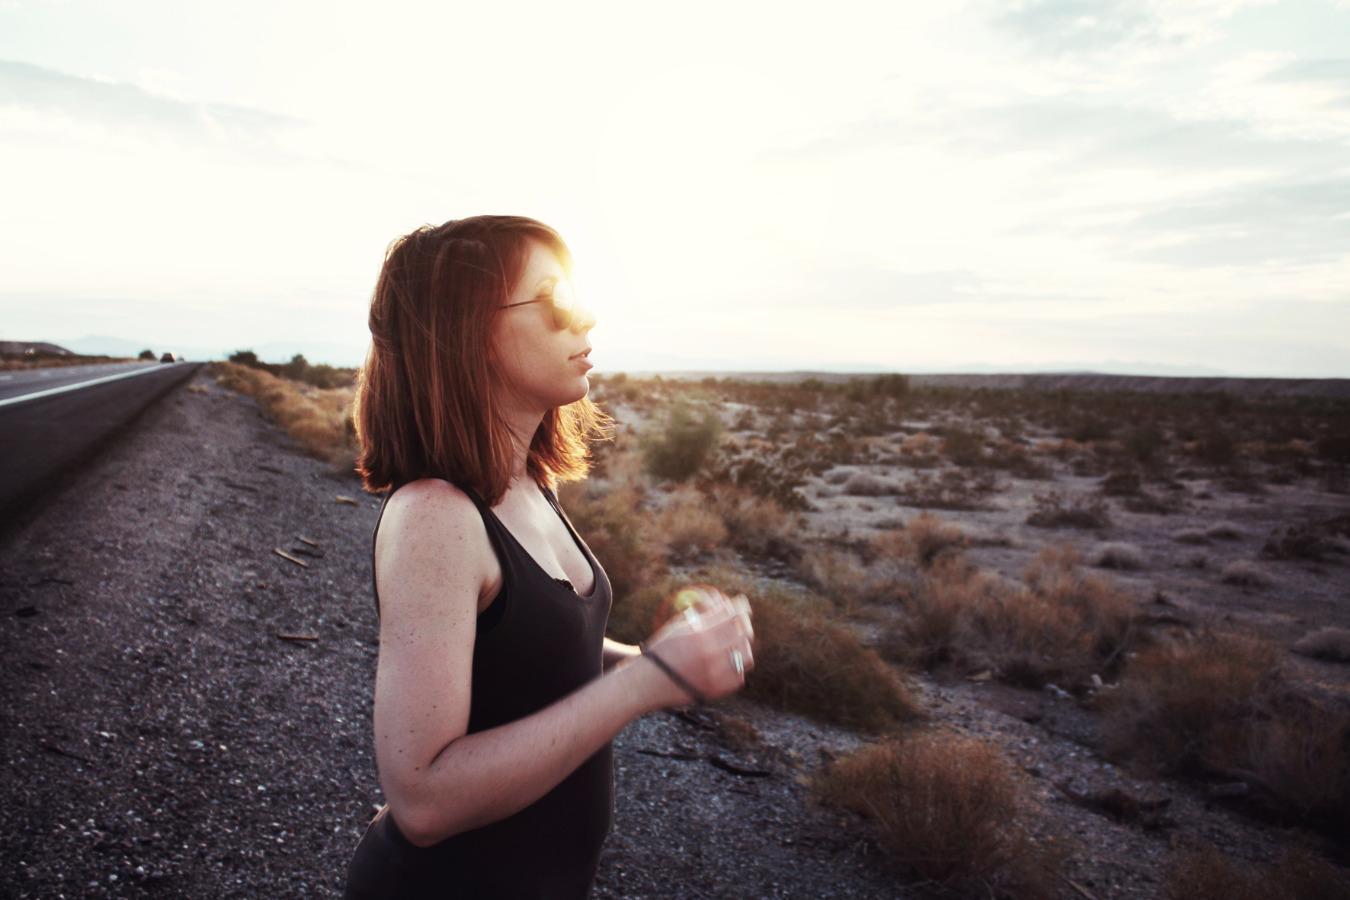 by photographer Stephane